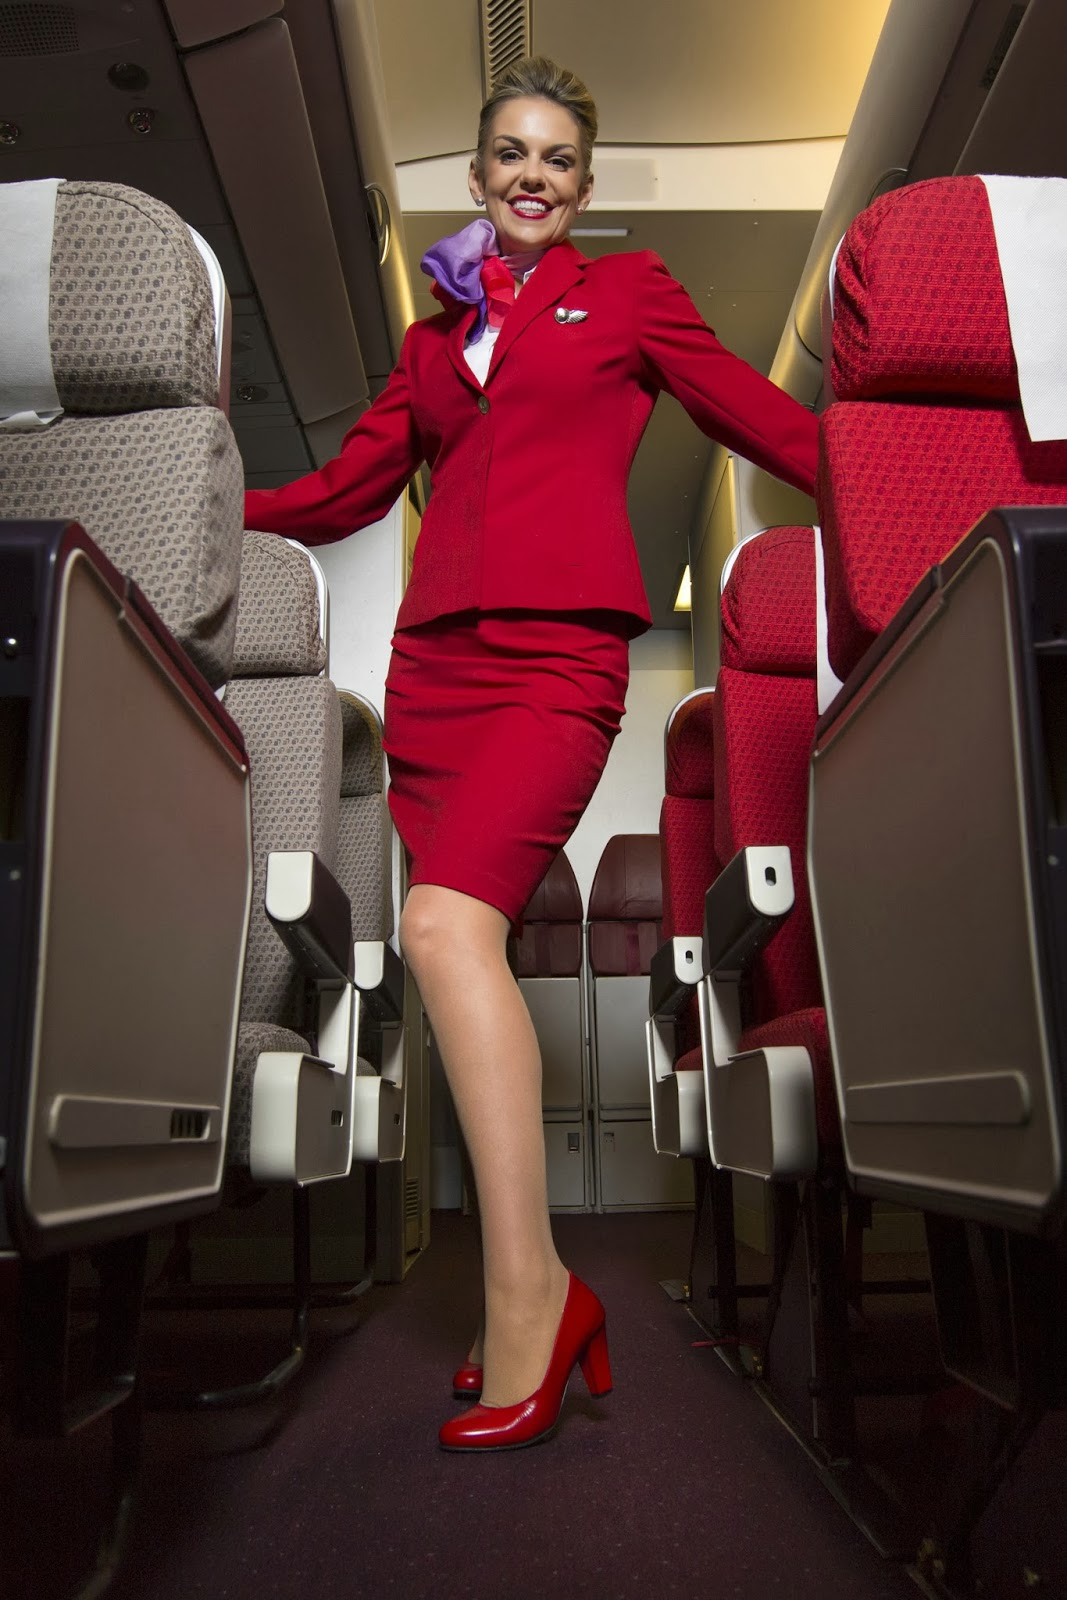 women-flight-attendant-clips